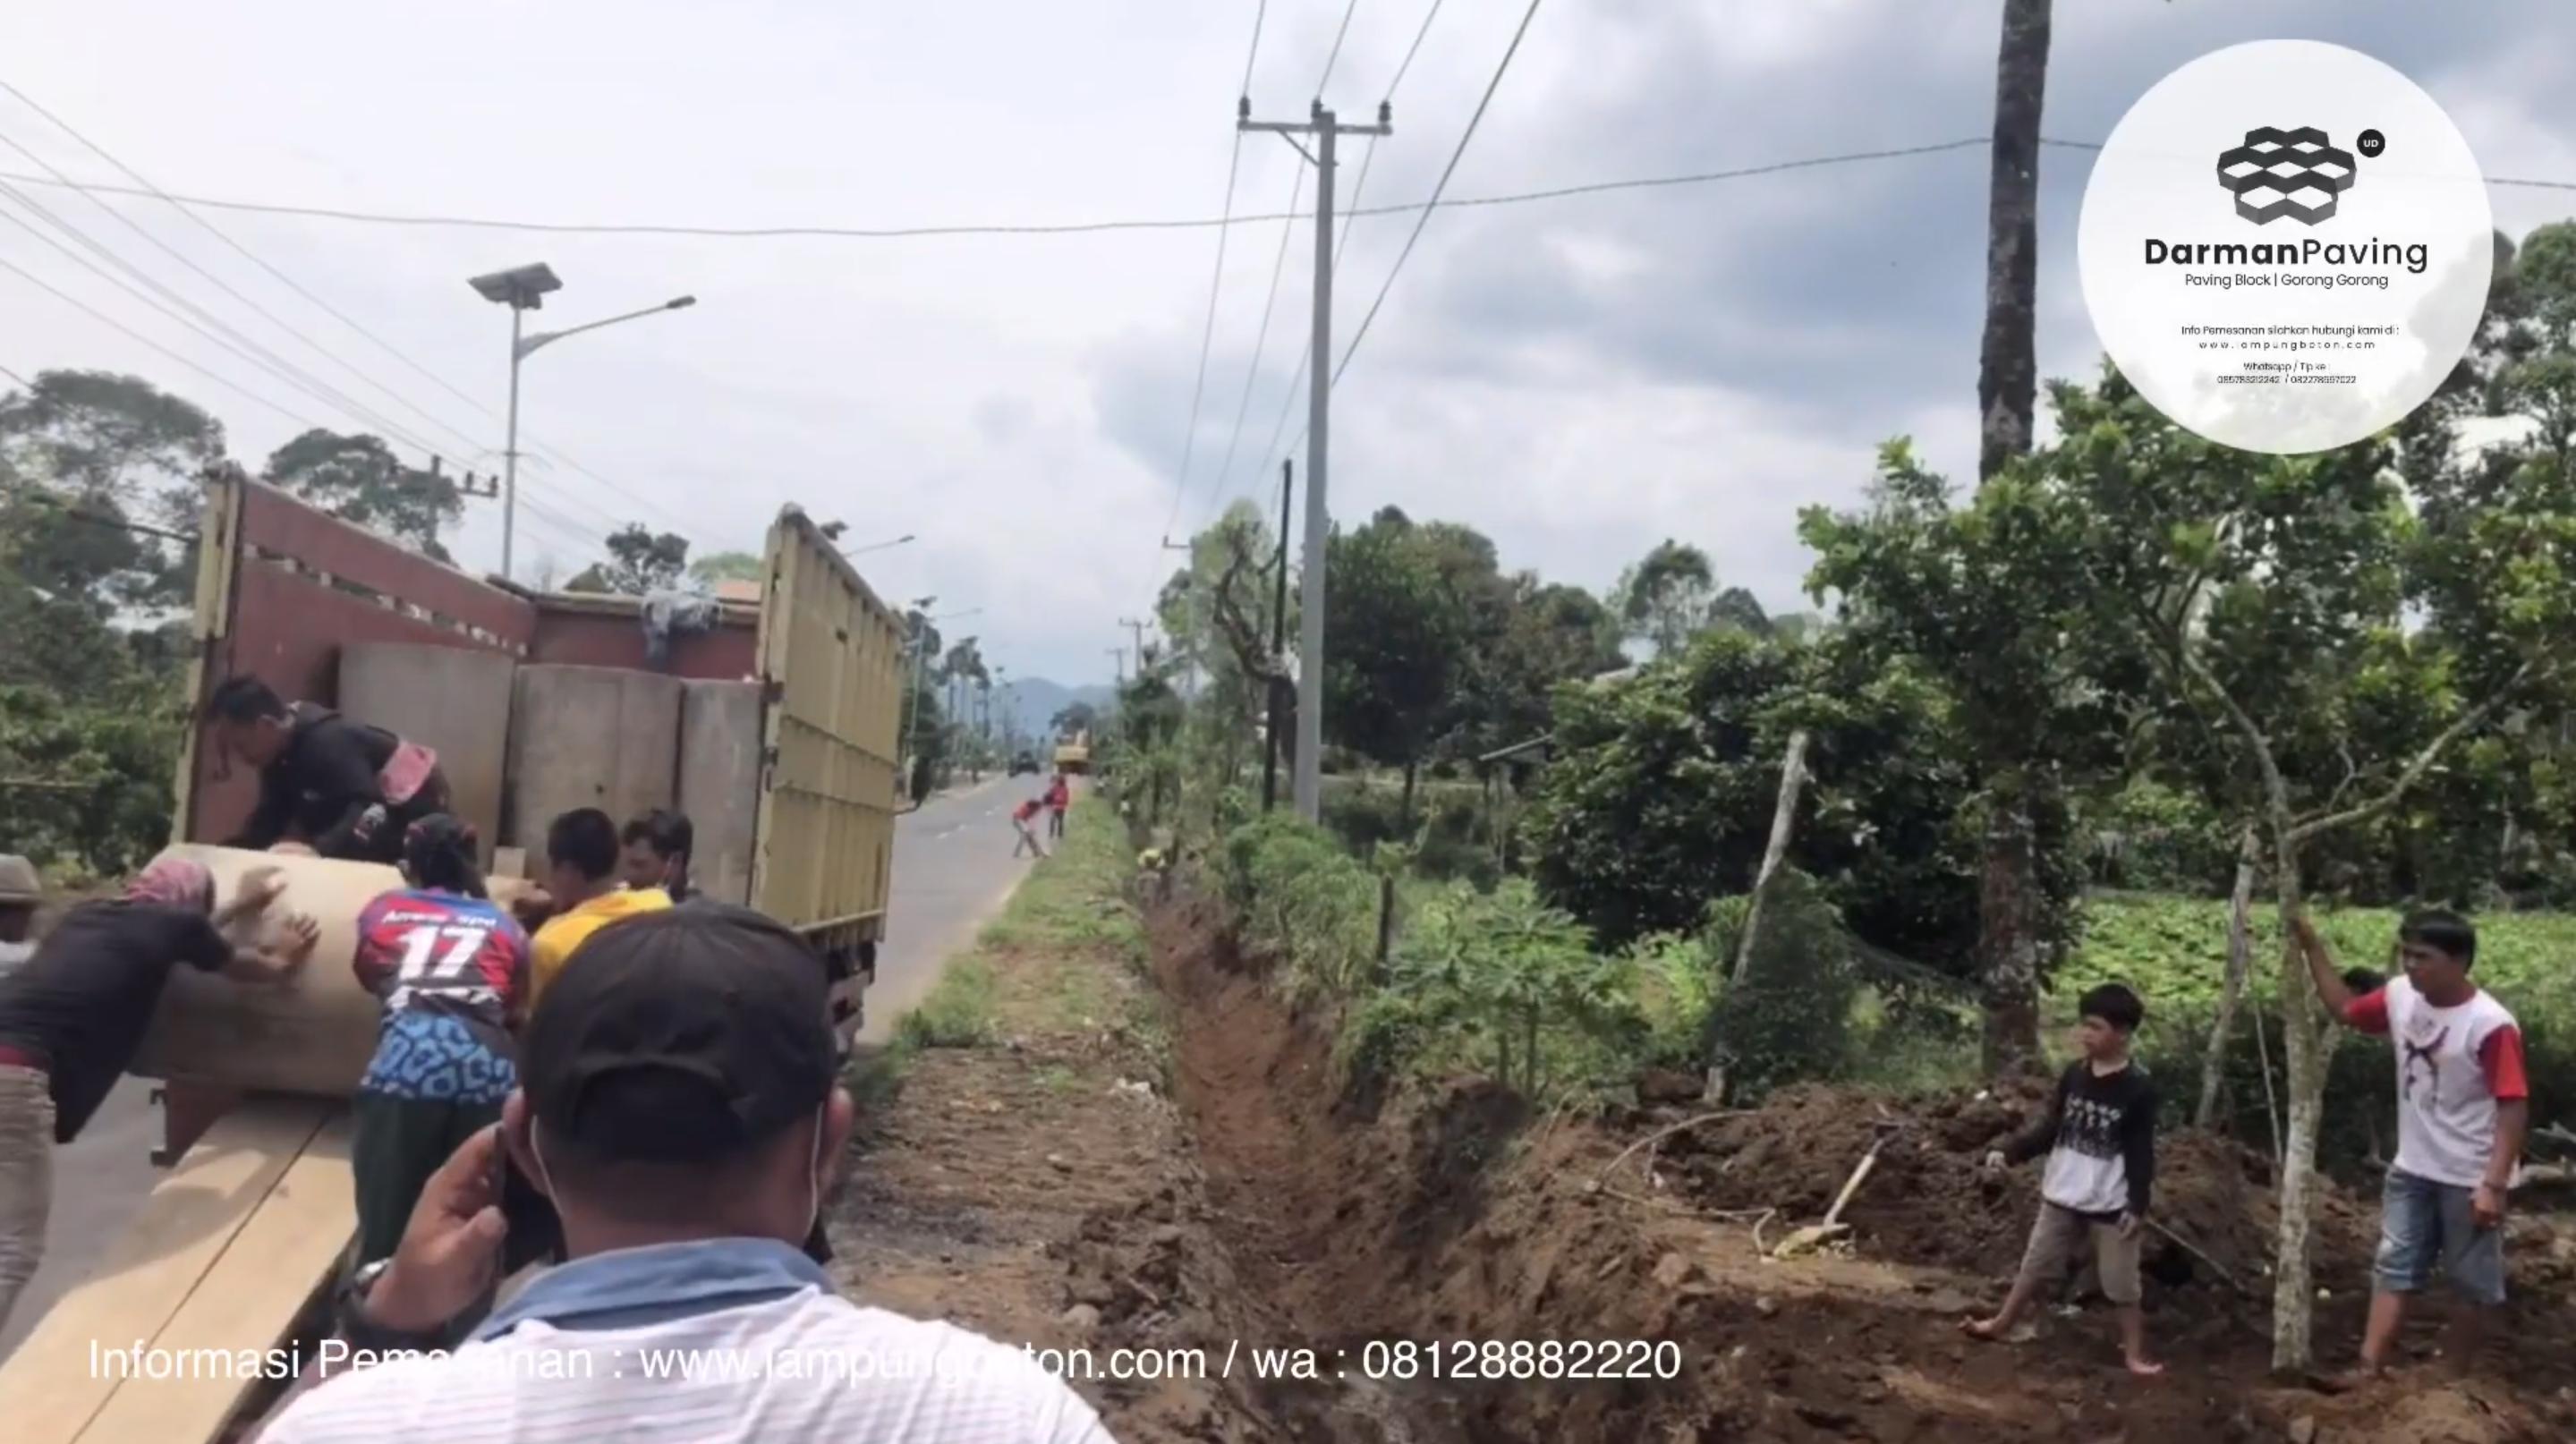 Proyek Order & Pemasangan Gorong-Gorong di Kembahang, Batu Brak, Lampung Barat